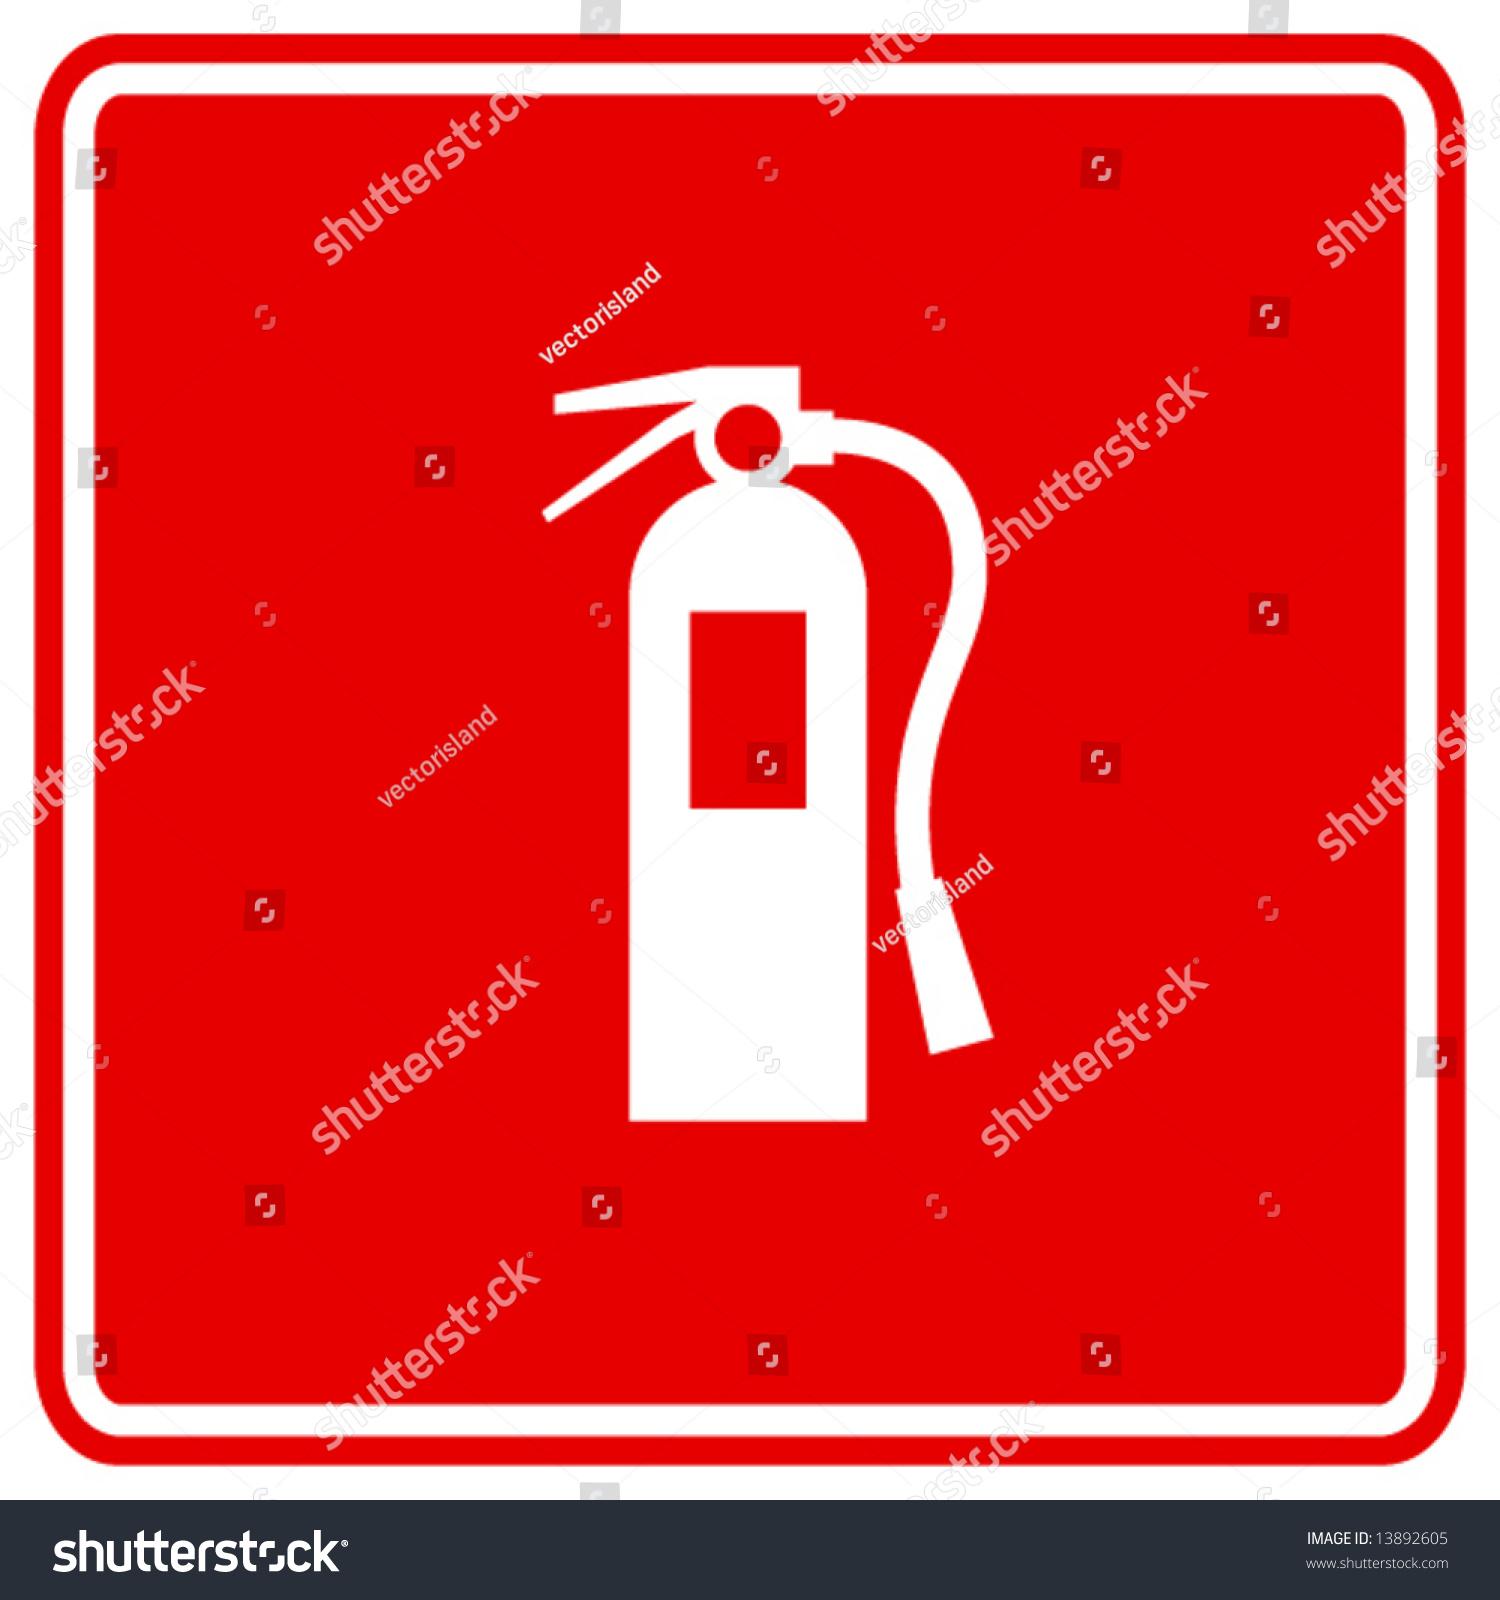 fire extinguisher sign stock vector illustration 13892605